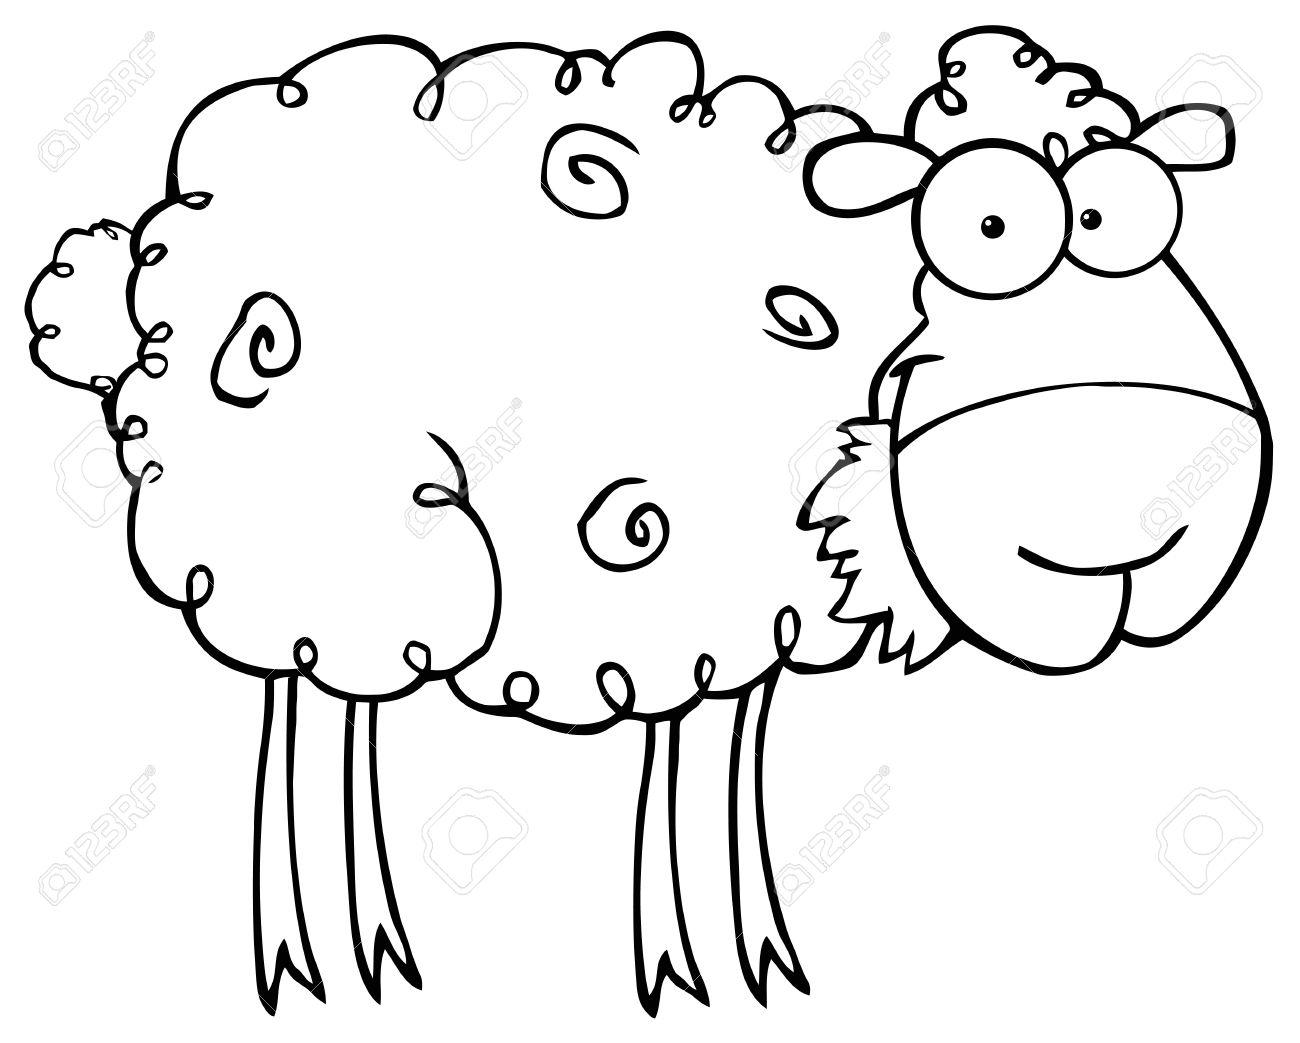 1300x1043 Sheep Cartoon Drawing Outlined Sheep Cartoon Character Eating